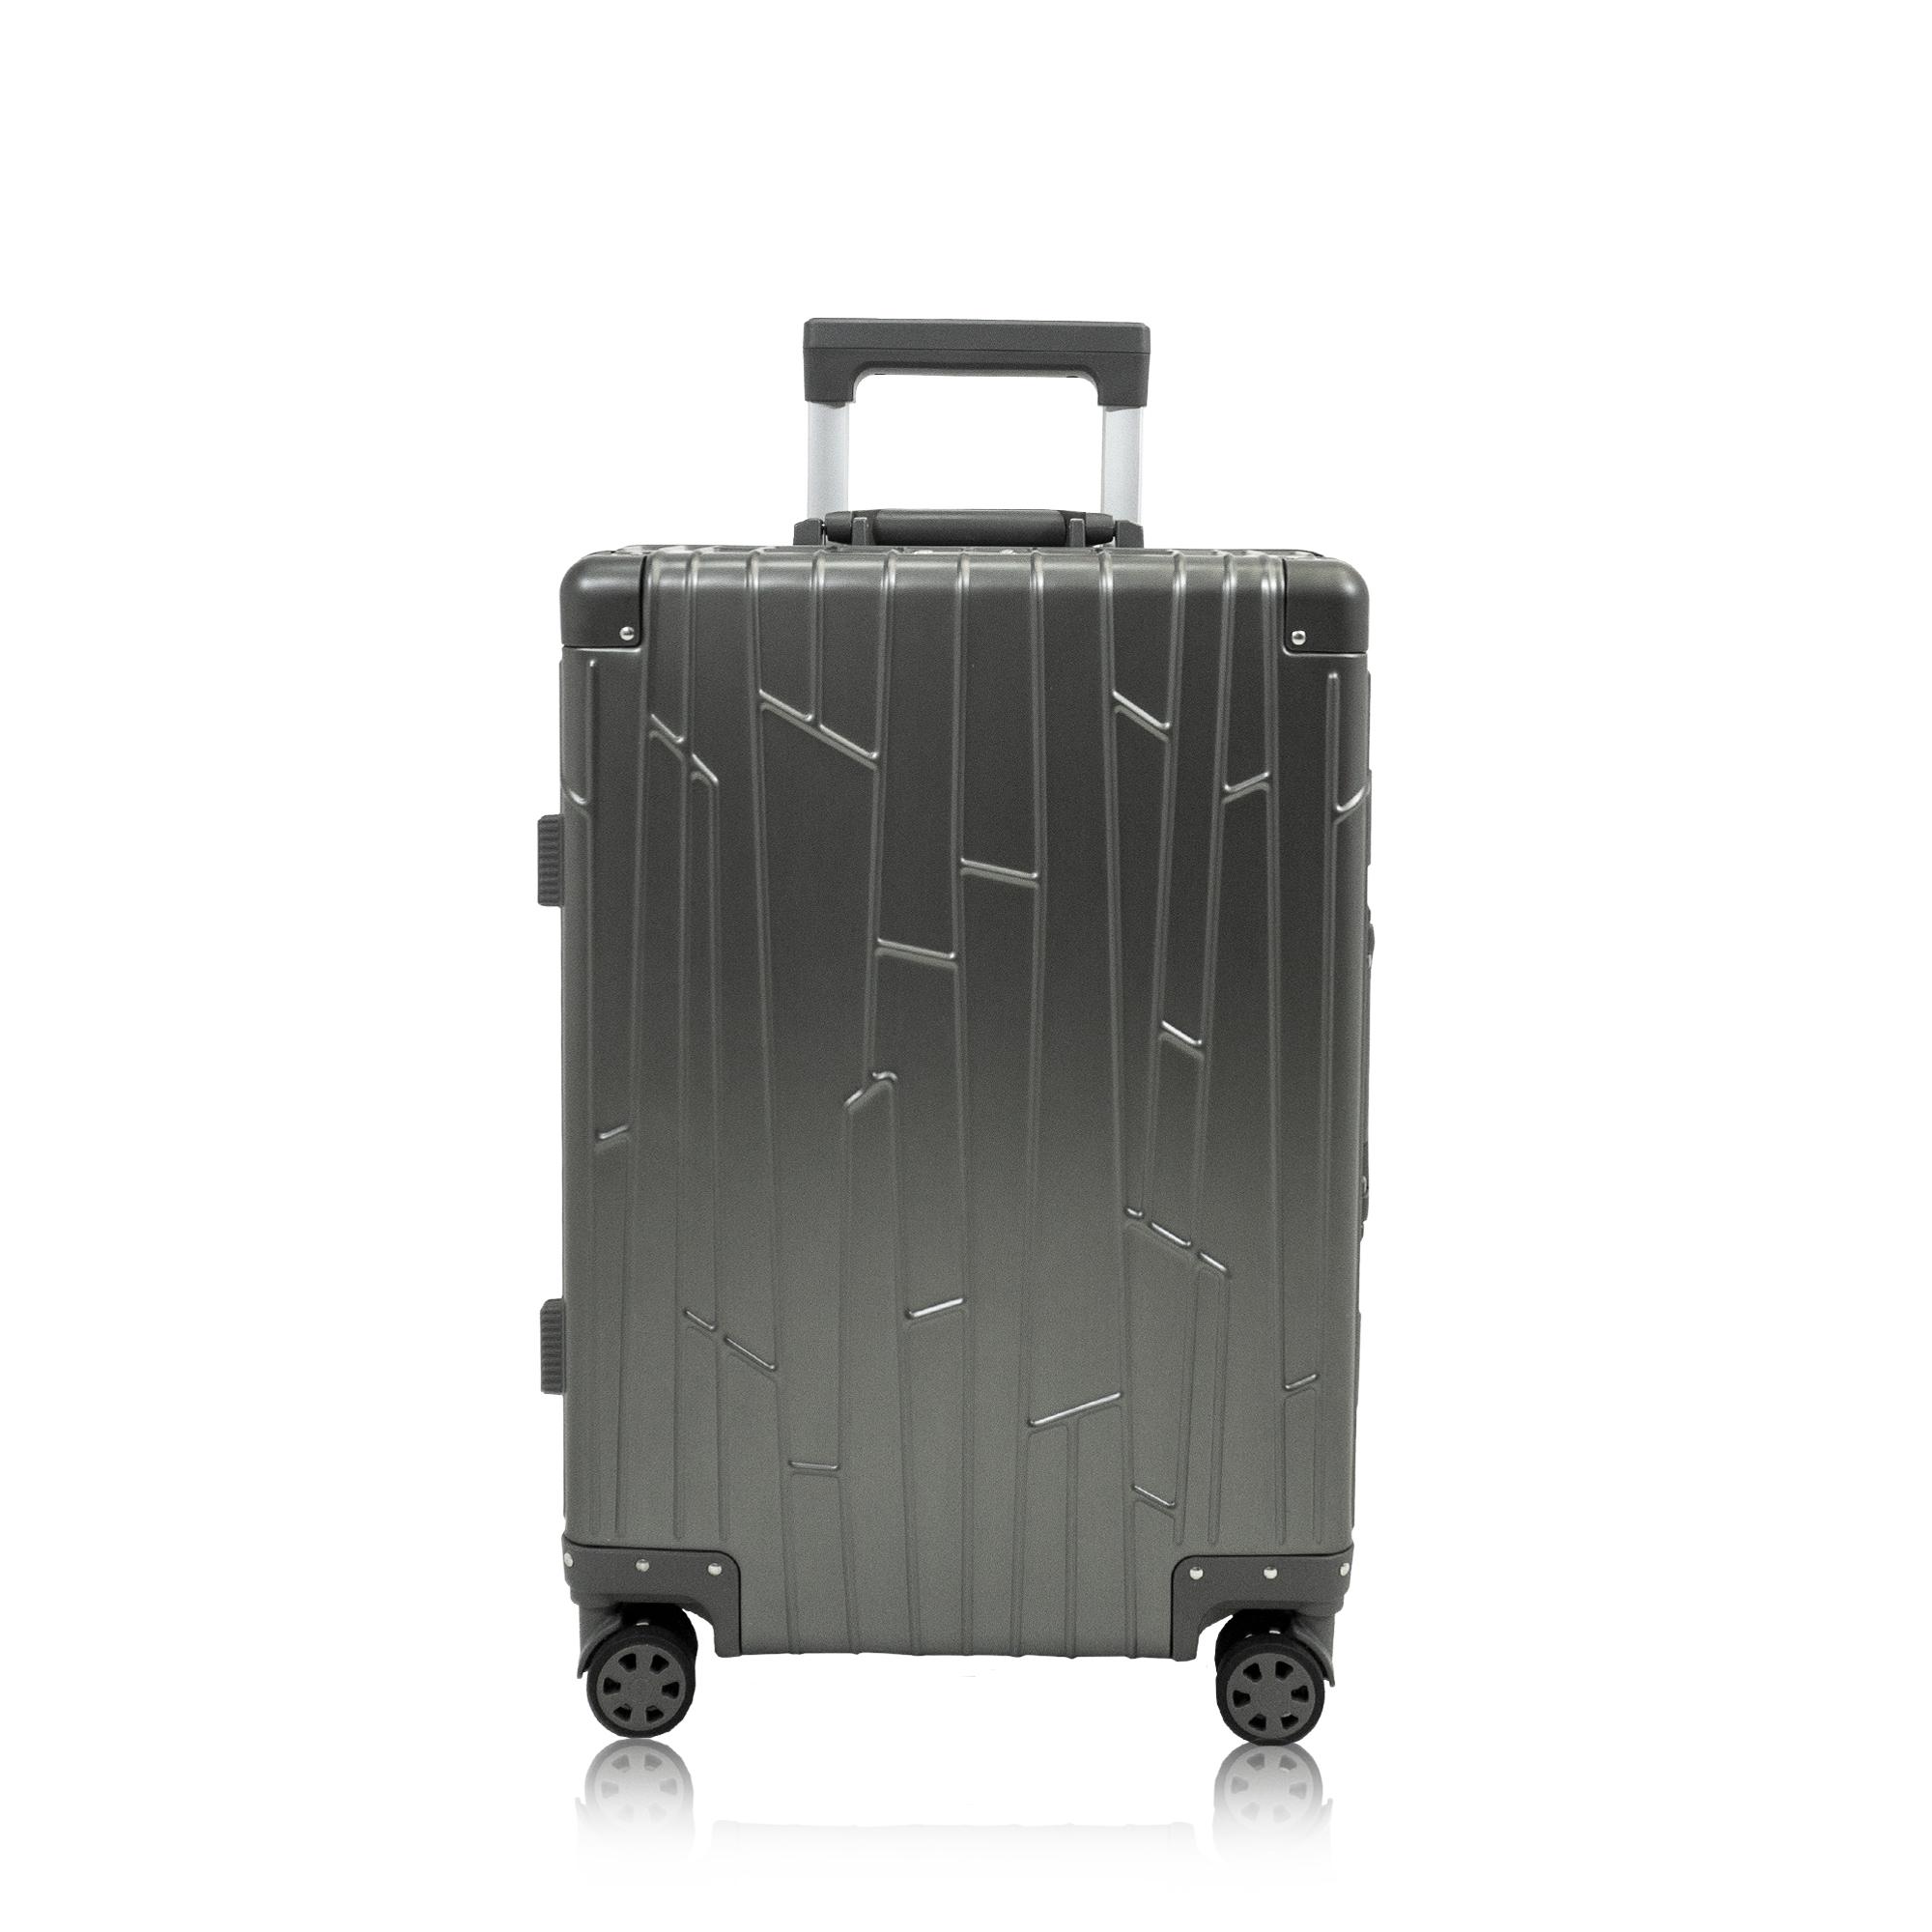 Cabin Trolley KOH-001G space grey aluminium suitcase gundel cabin luggage tsa-locks